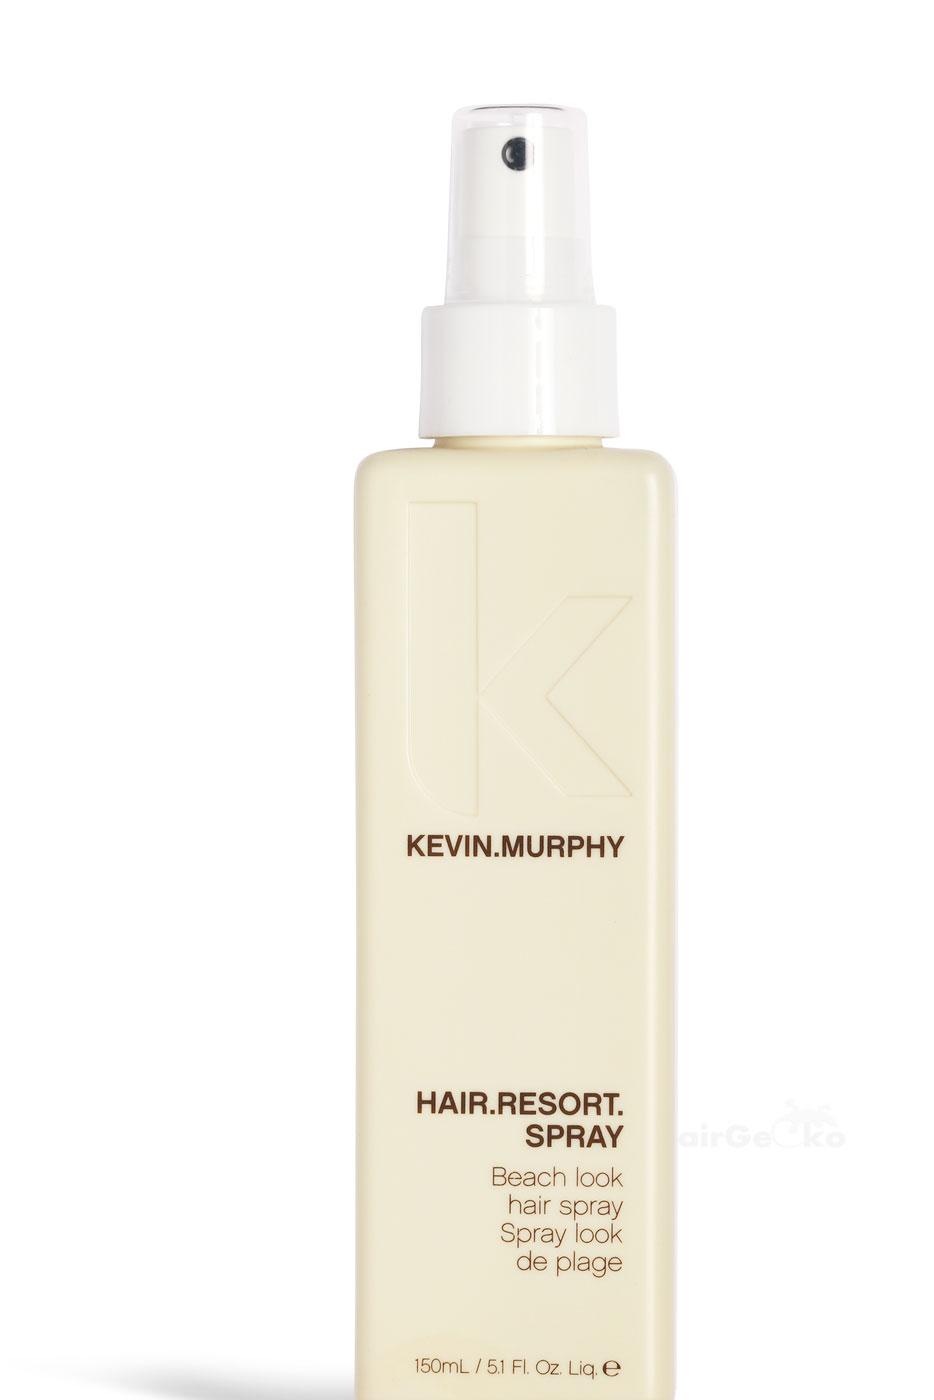 KEVIN.MURPHY HAIR.RESORT SPRAY 150 ml